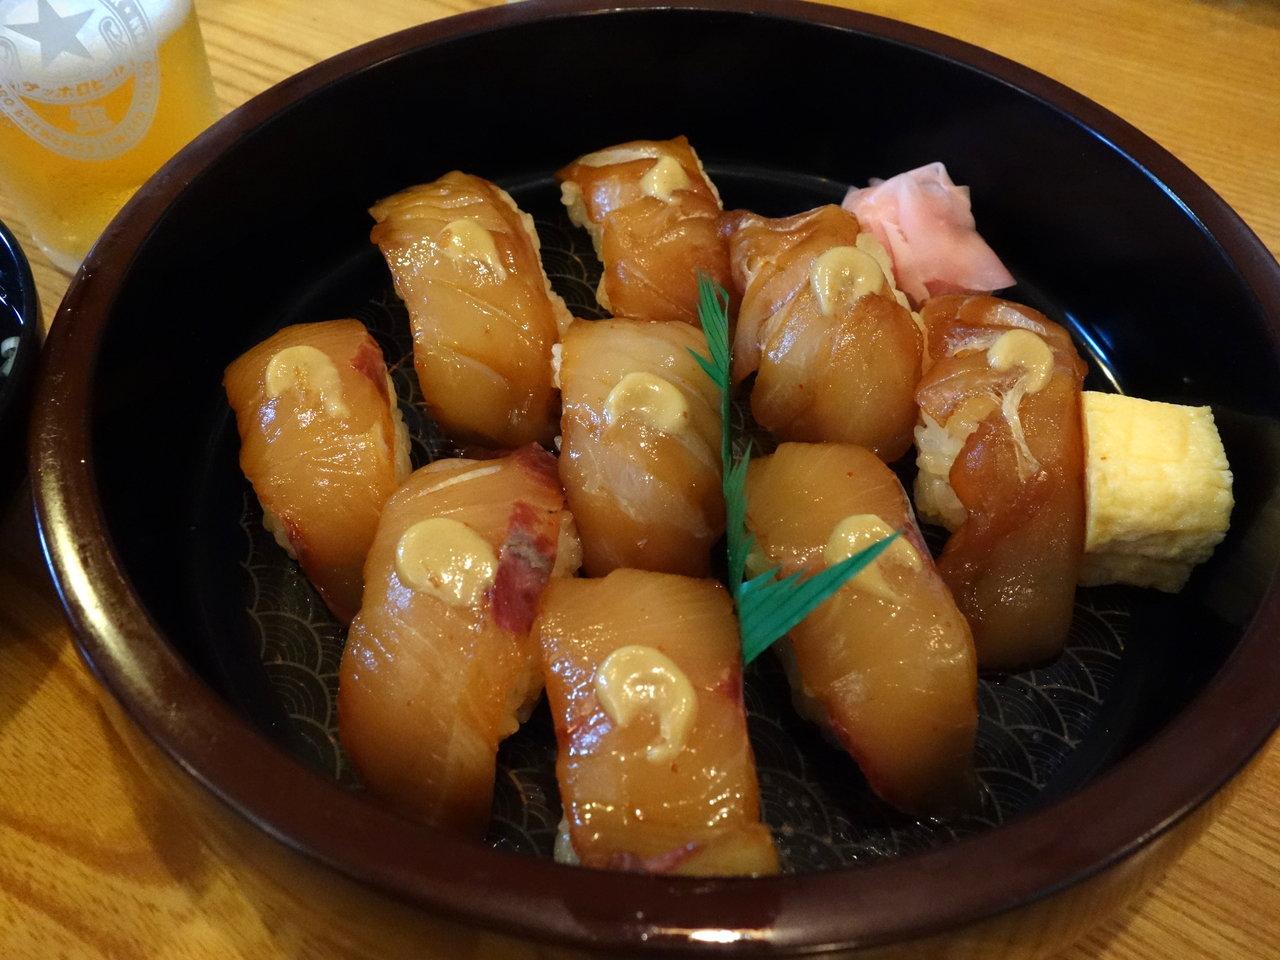 島寿司の画像 p1_35